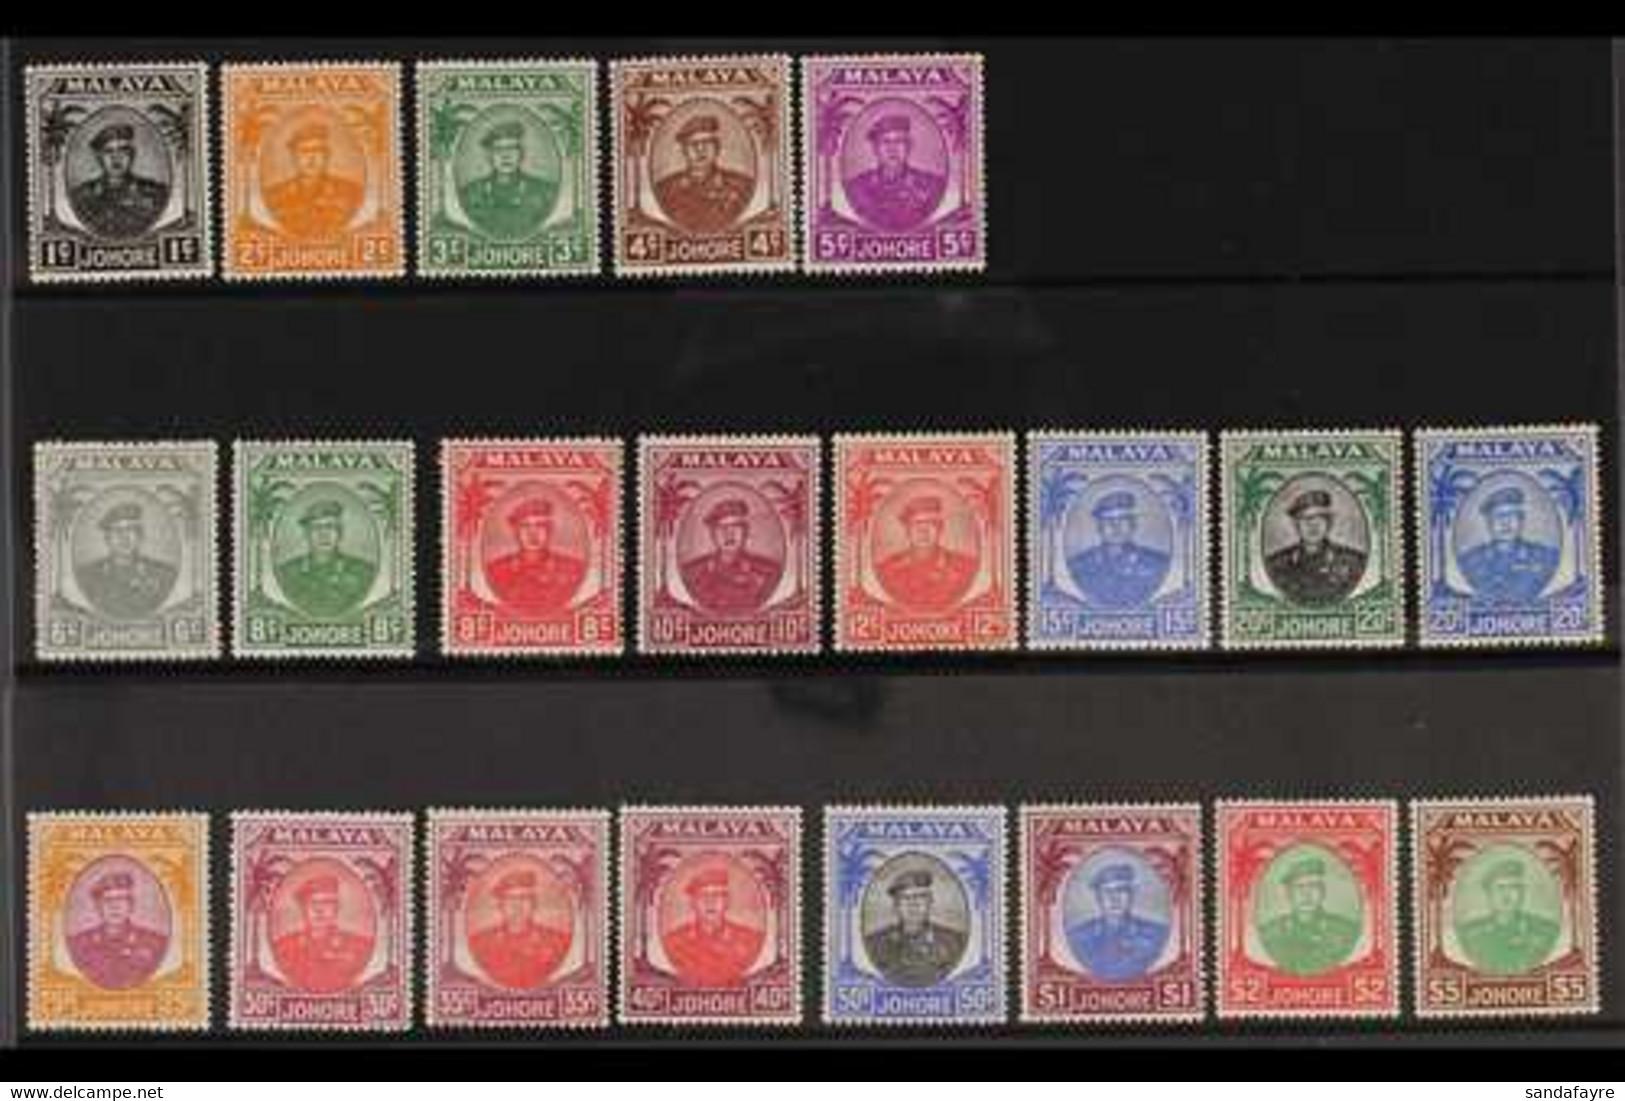 JOHORE 1949-55 Sultan Ibrahim Set, SG 133/147, Very Fine Mint (21 Stamps) For More Images, Please Visit Http://www.sanda - Non Classificati